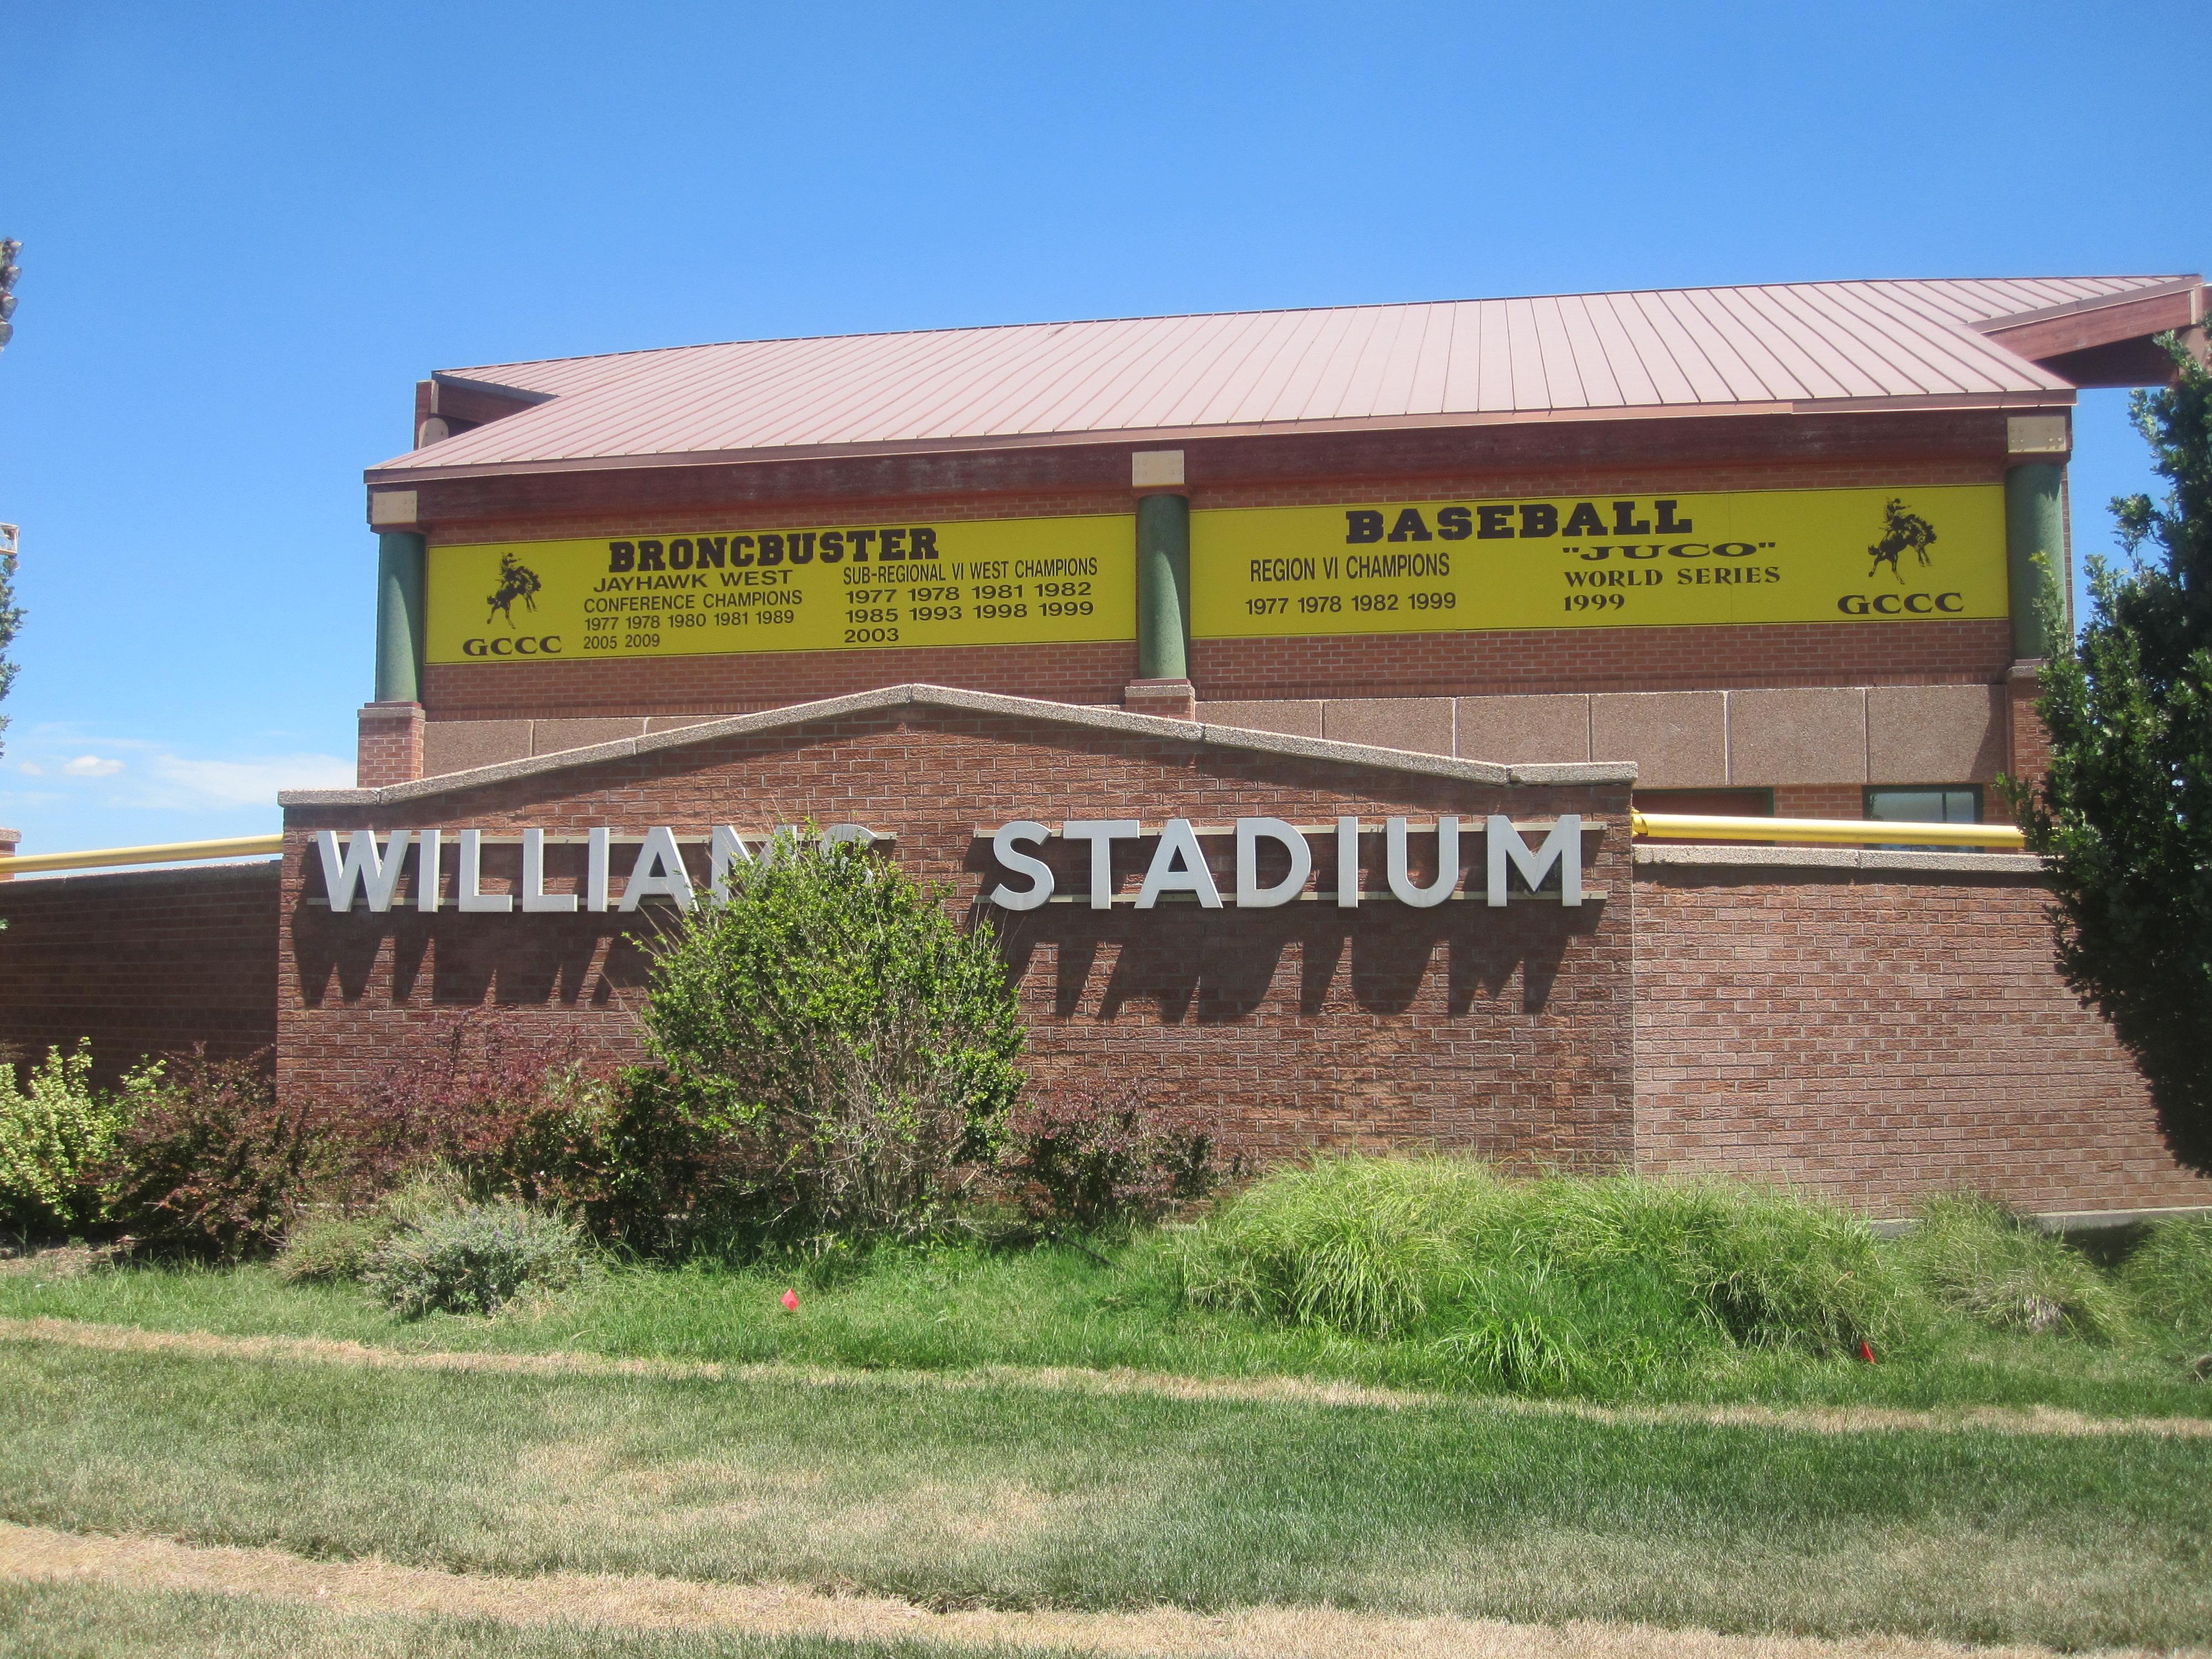 File williams stadium garden city community college img 5859 jpg wikimedia commons for Garden city community college baseball